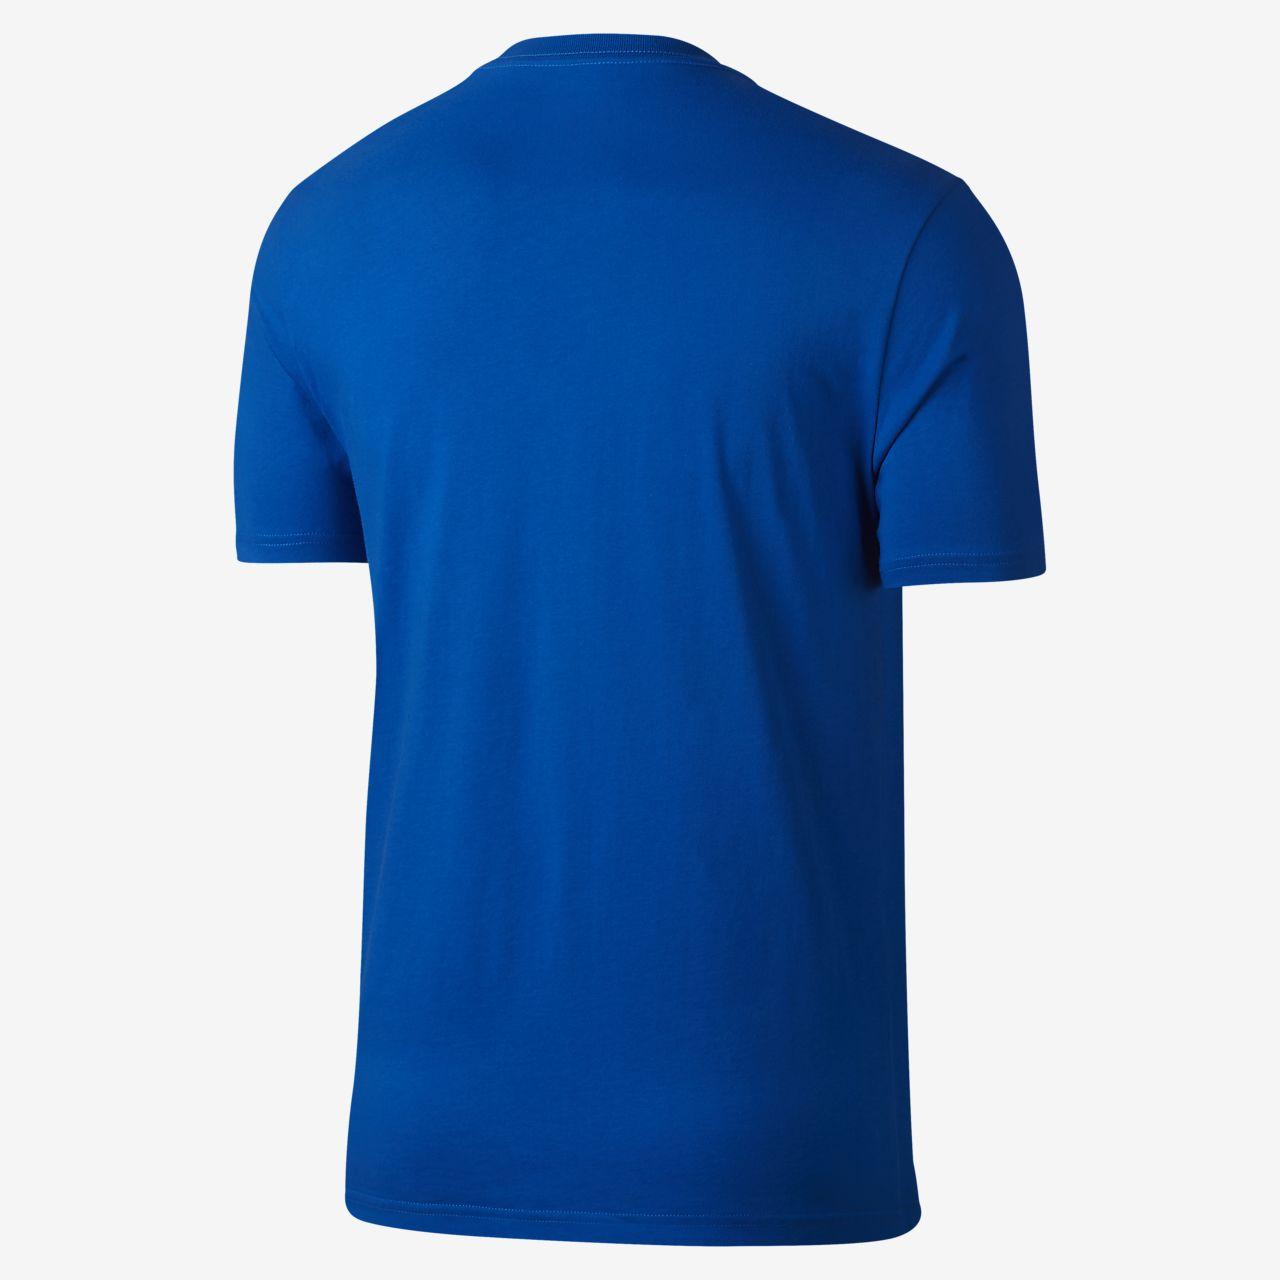 ... Converse Half Mesh Men's T-Shirt